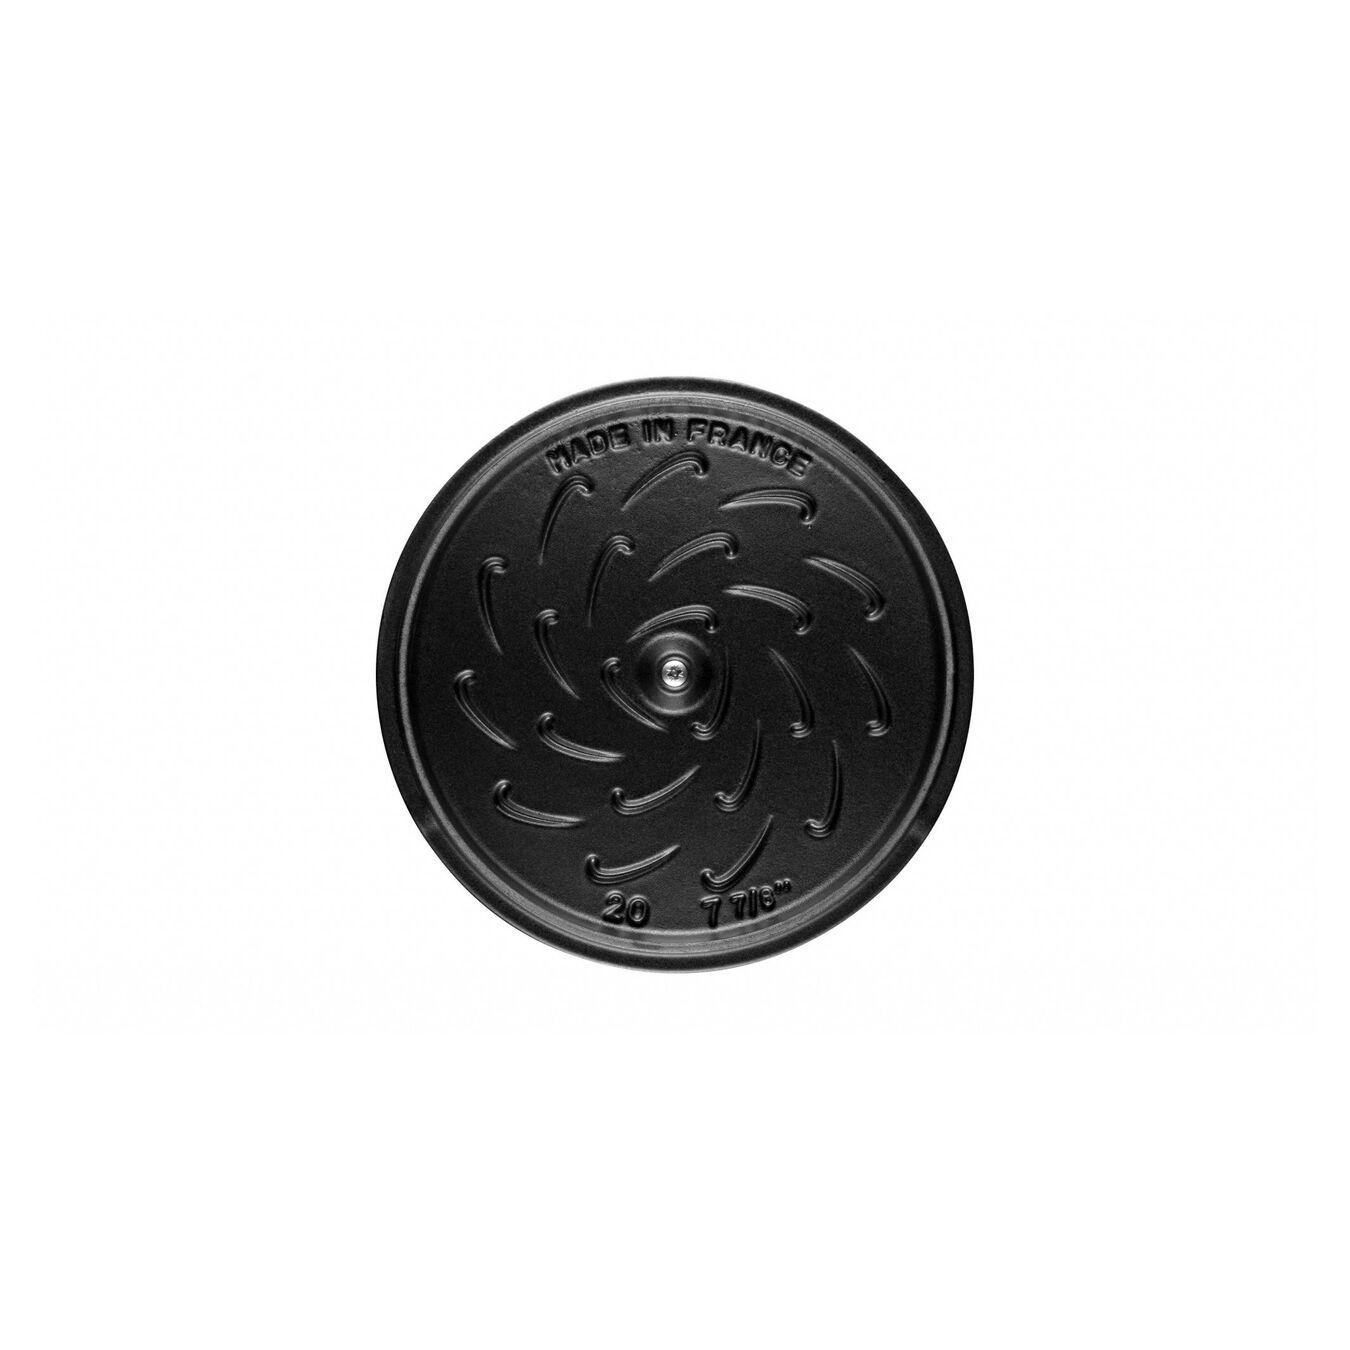 Cocotte 20 cm, Rond(e), Grenadine, Fonte,,large 9